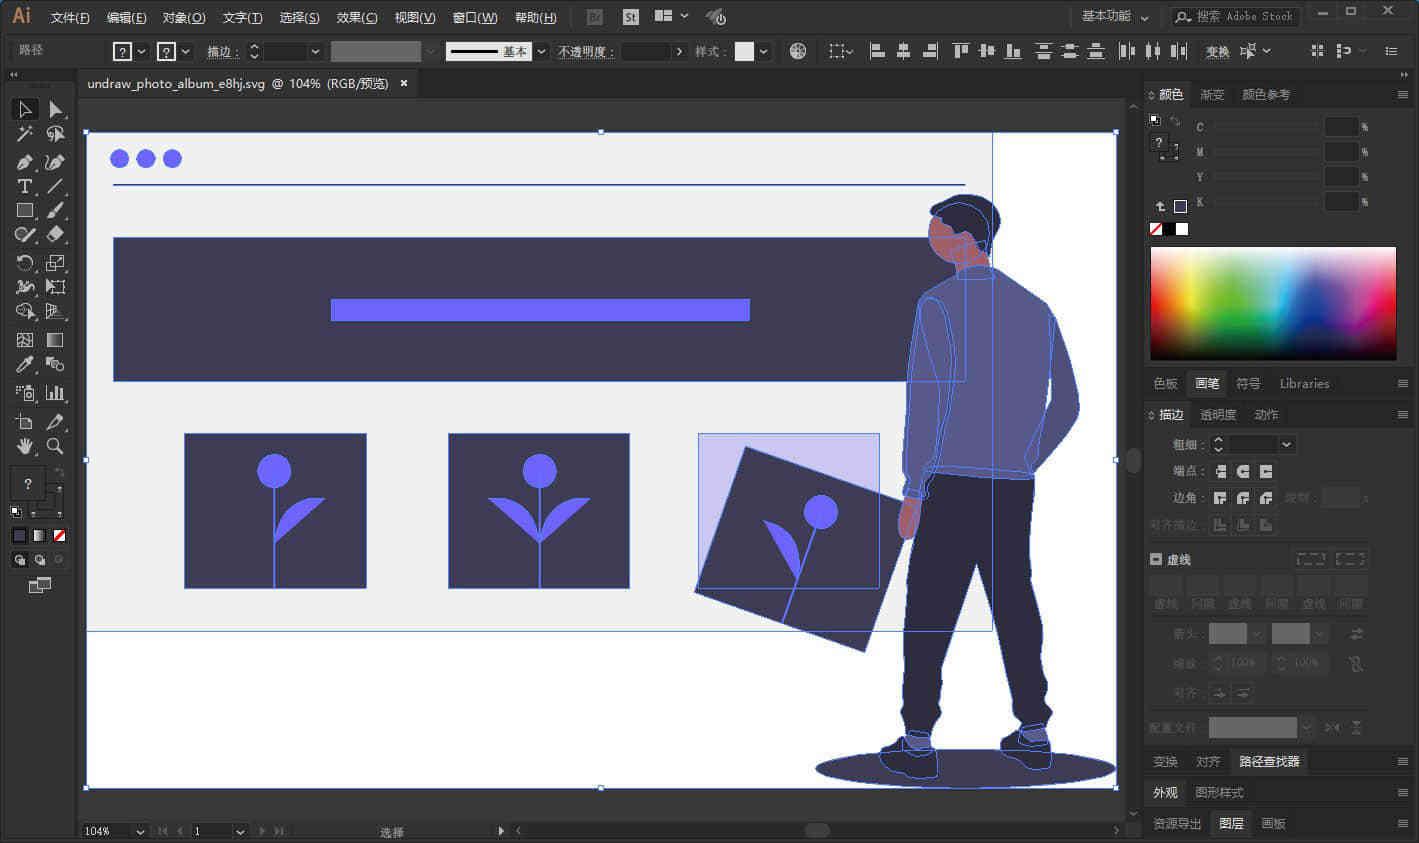 illustrations undraw – 插画图片素材网,提供svg和png图片下载